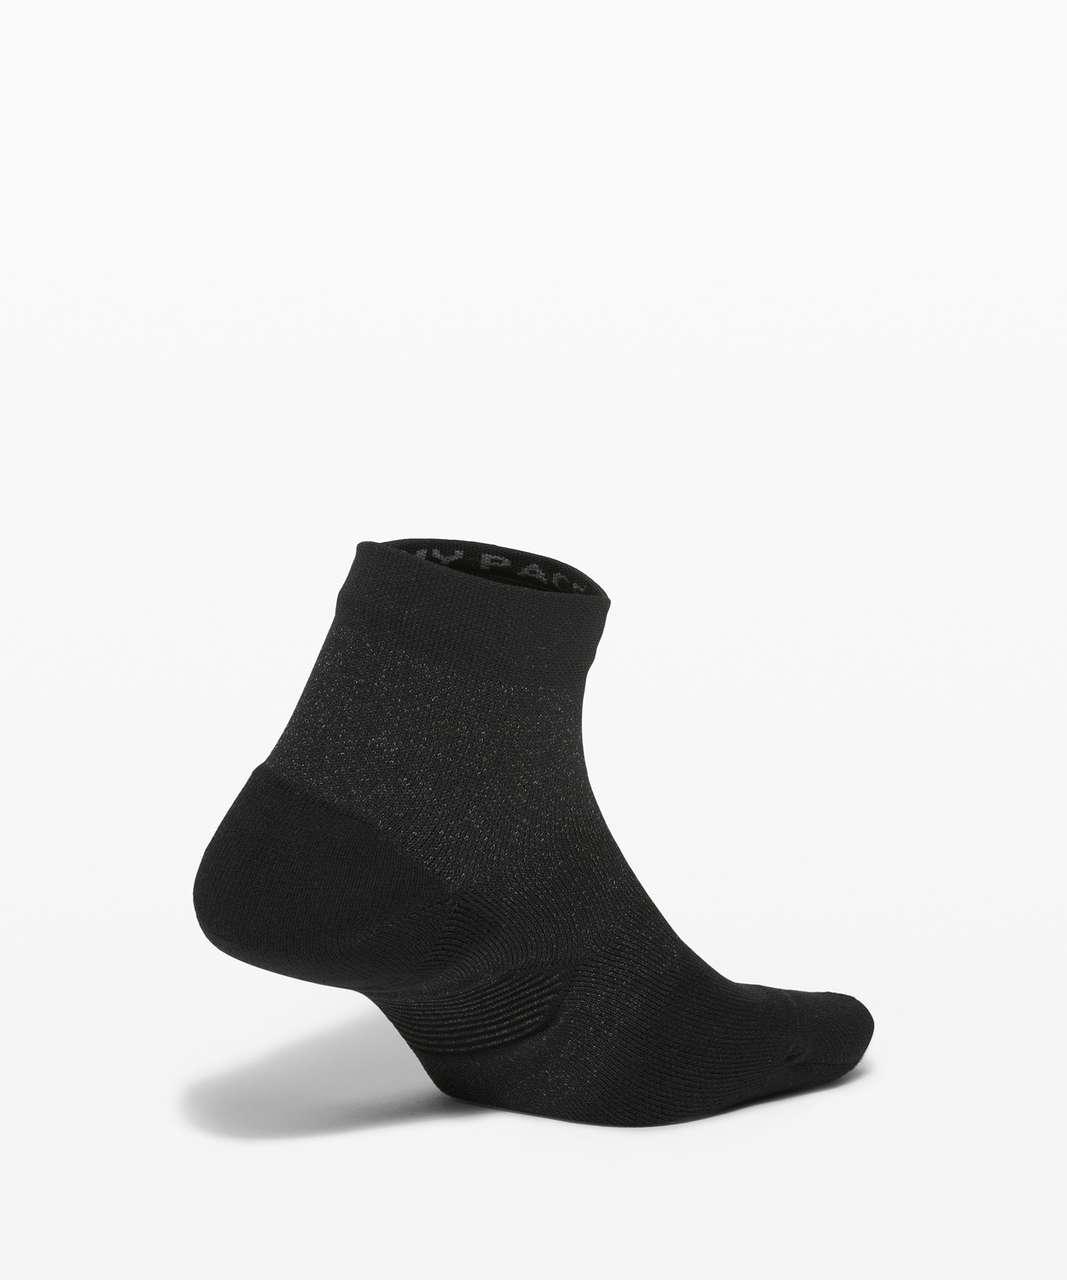 Lululemon Speed Ankle Sock *Silver - Black